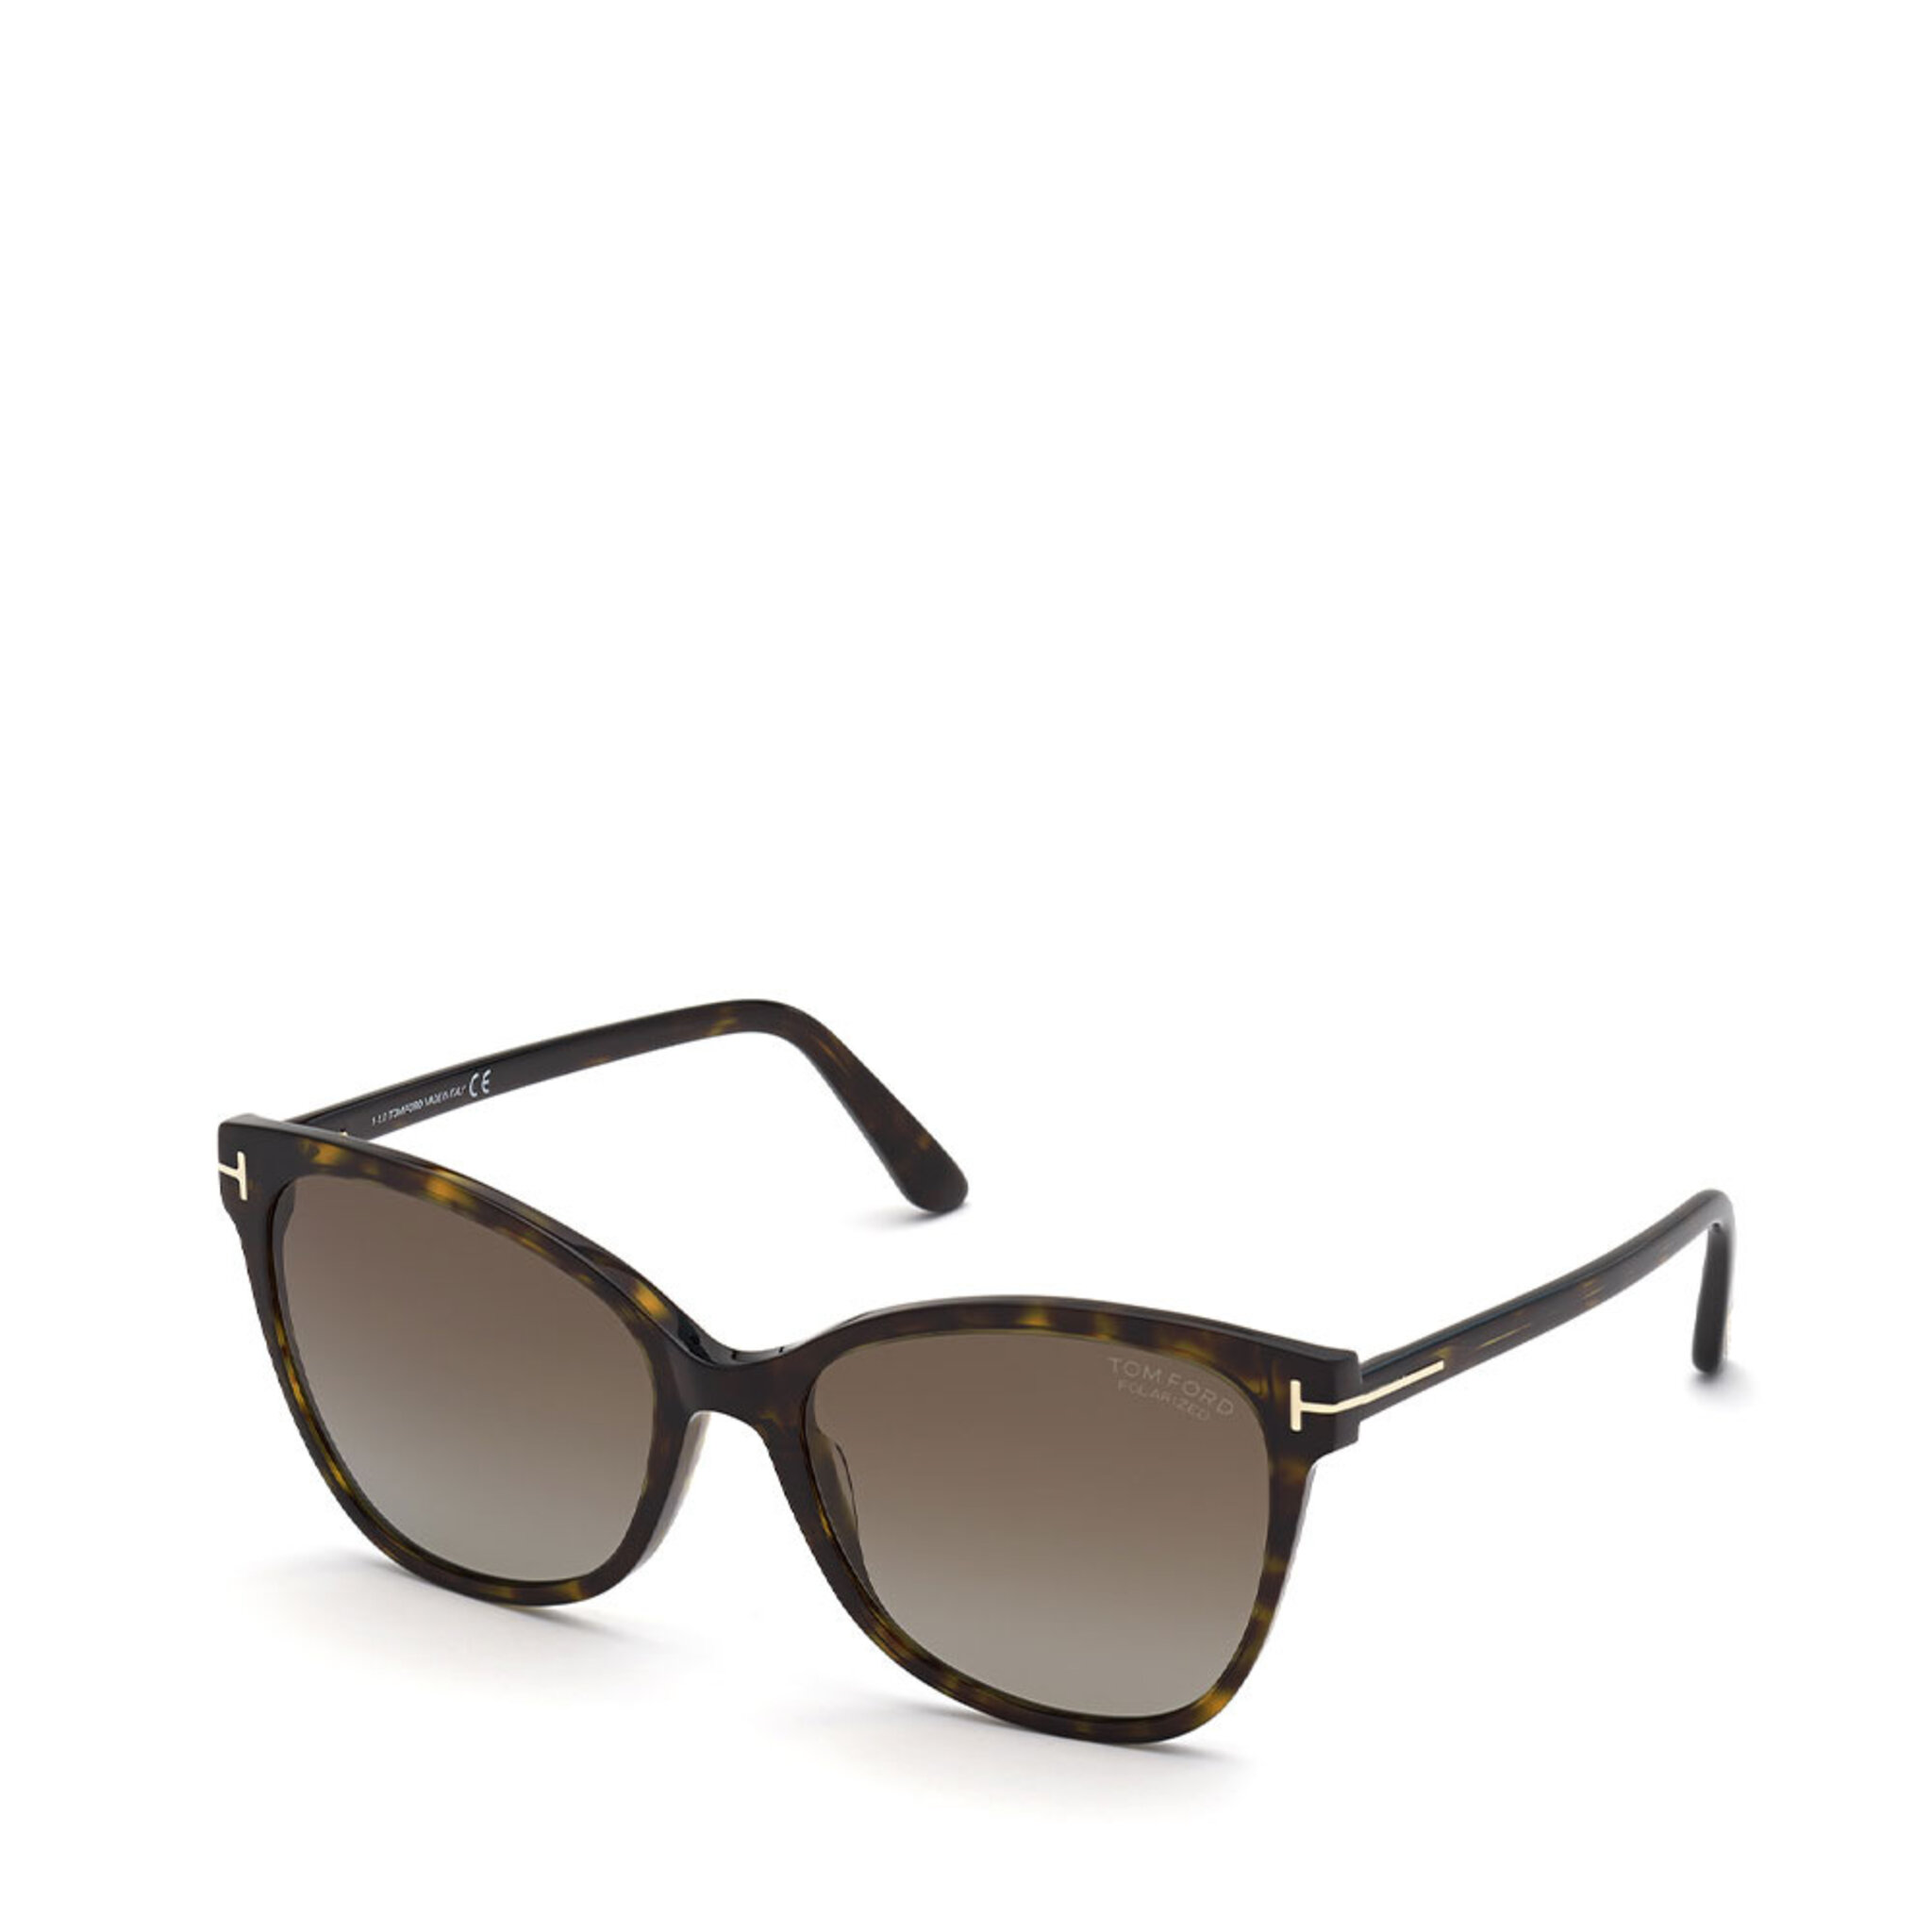 Sunglasses FT0844 Ani